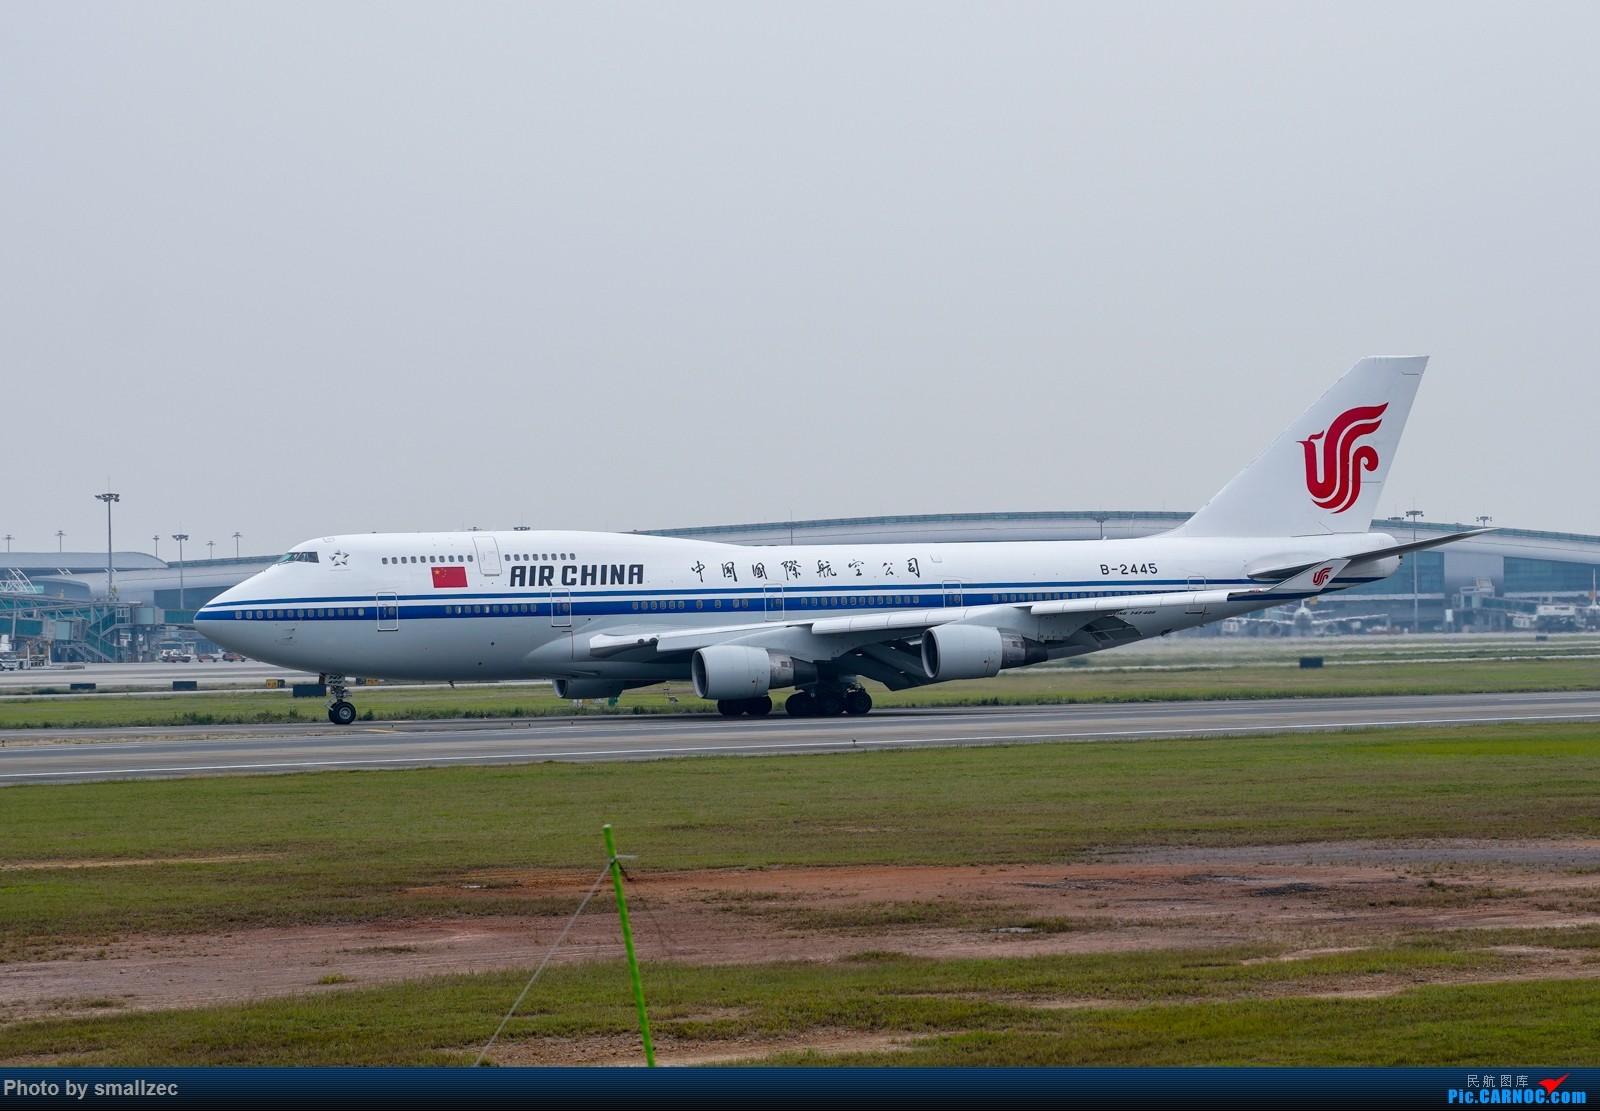 Re:[原创]难得休假,CAN一顿乱拍,顺带试试新镜头 BOEING 747-400 B-2445 广州白云国际机场